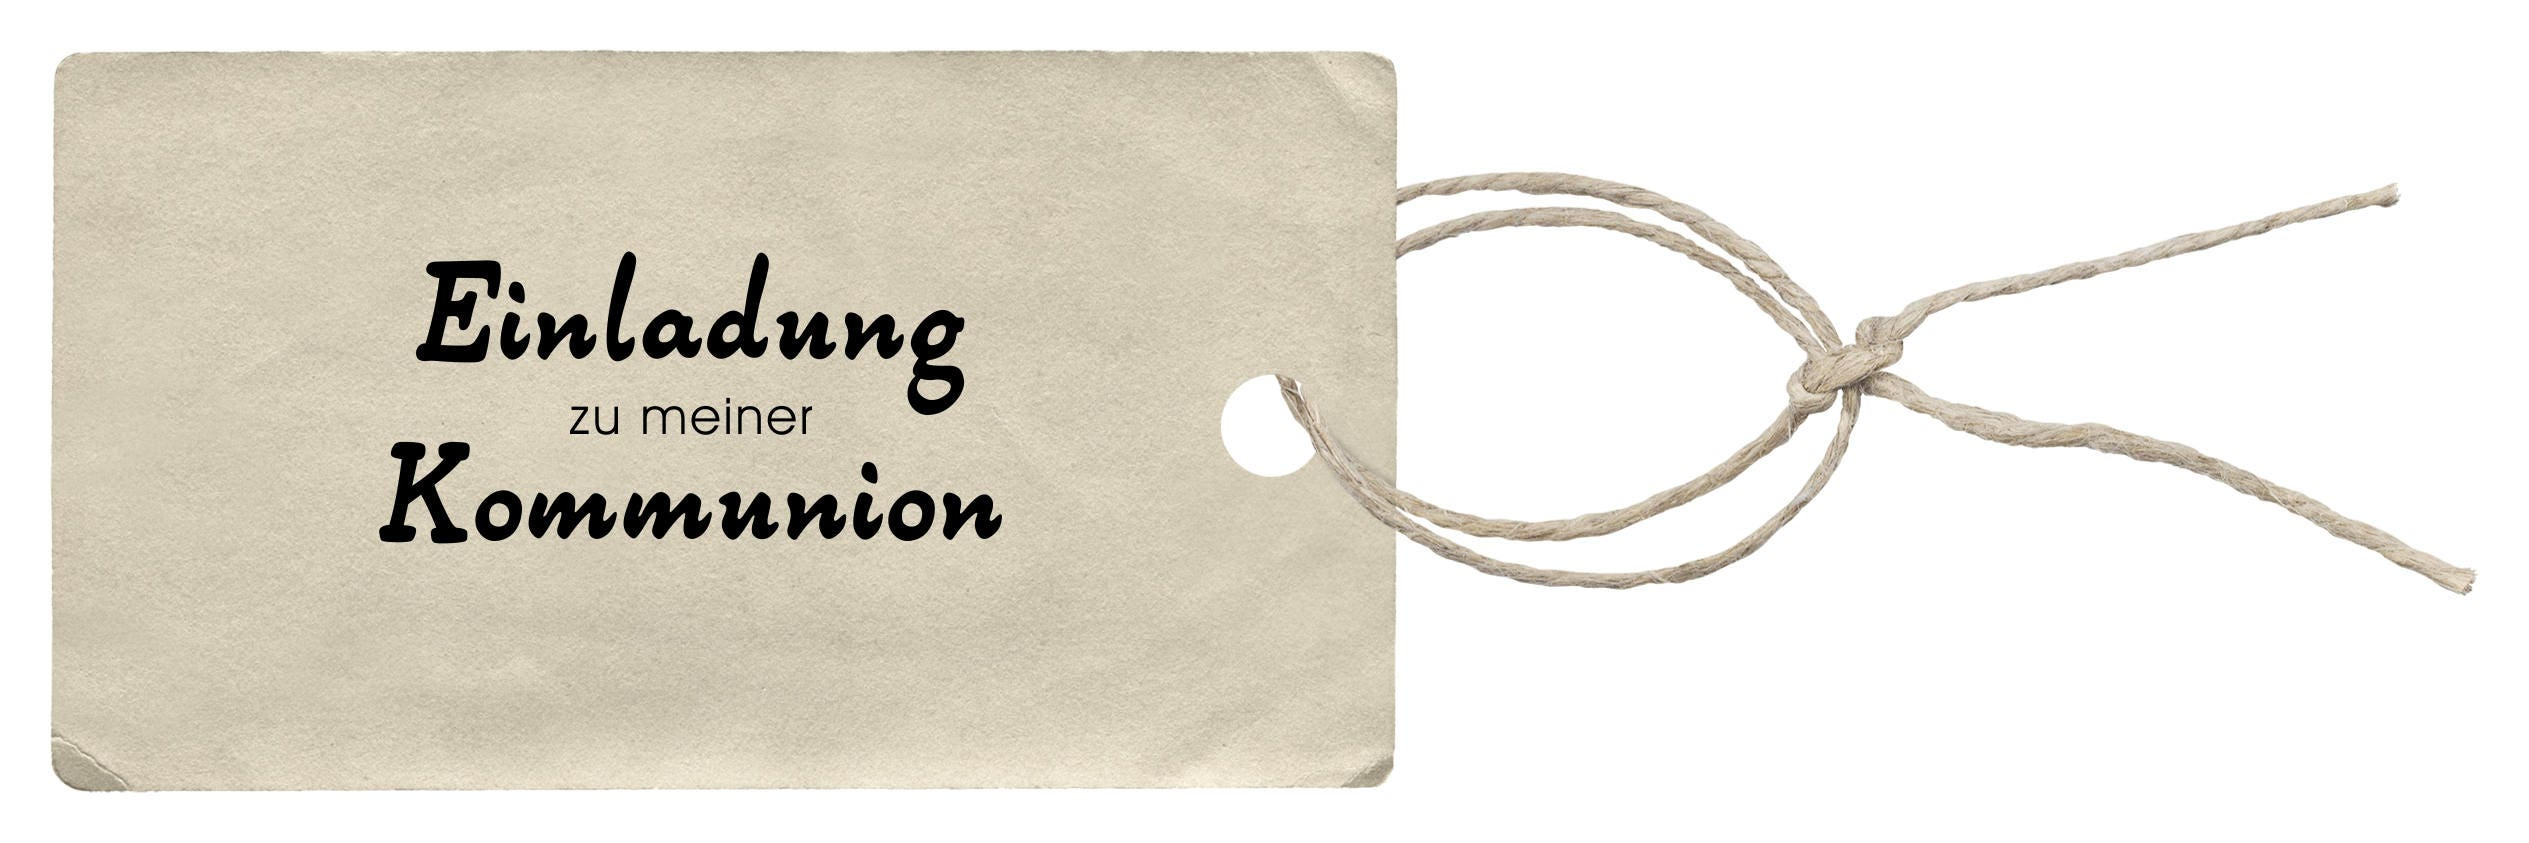 Stamp Invitation to my communion handle 30 x 55 mm